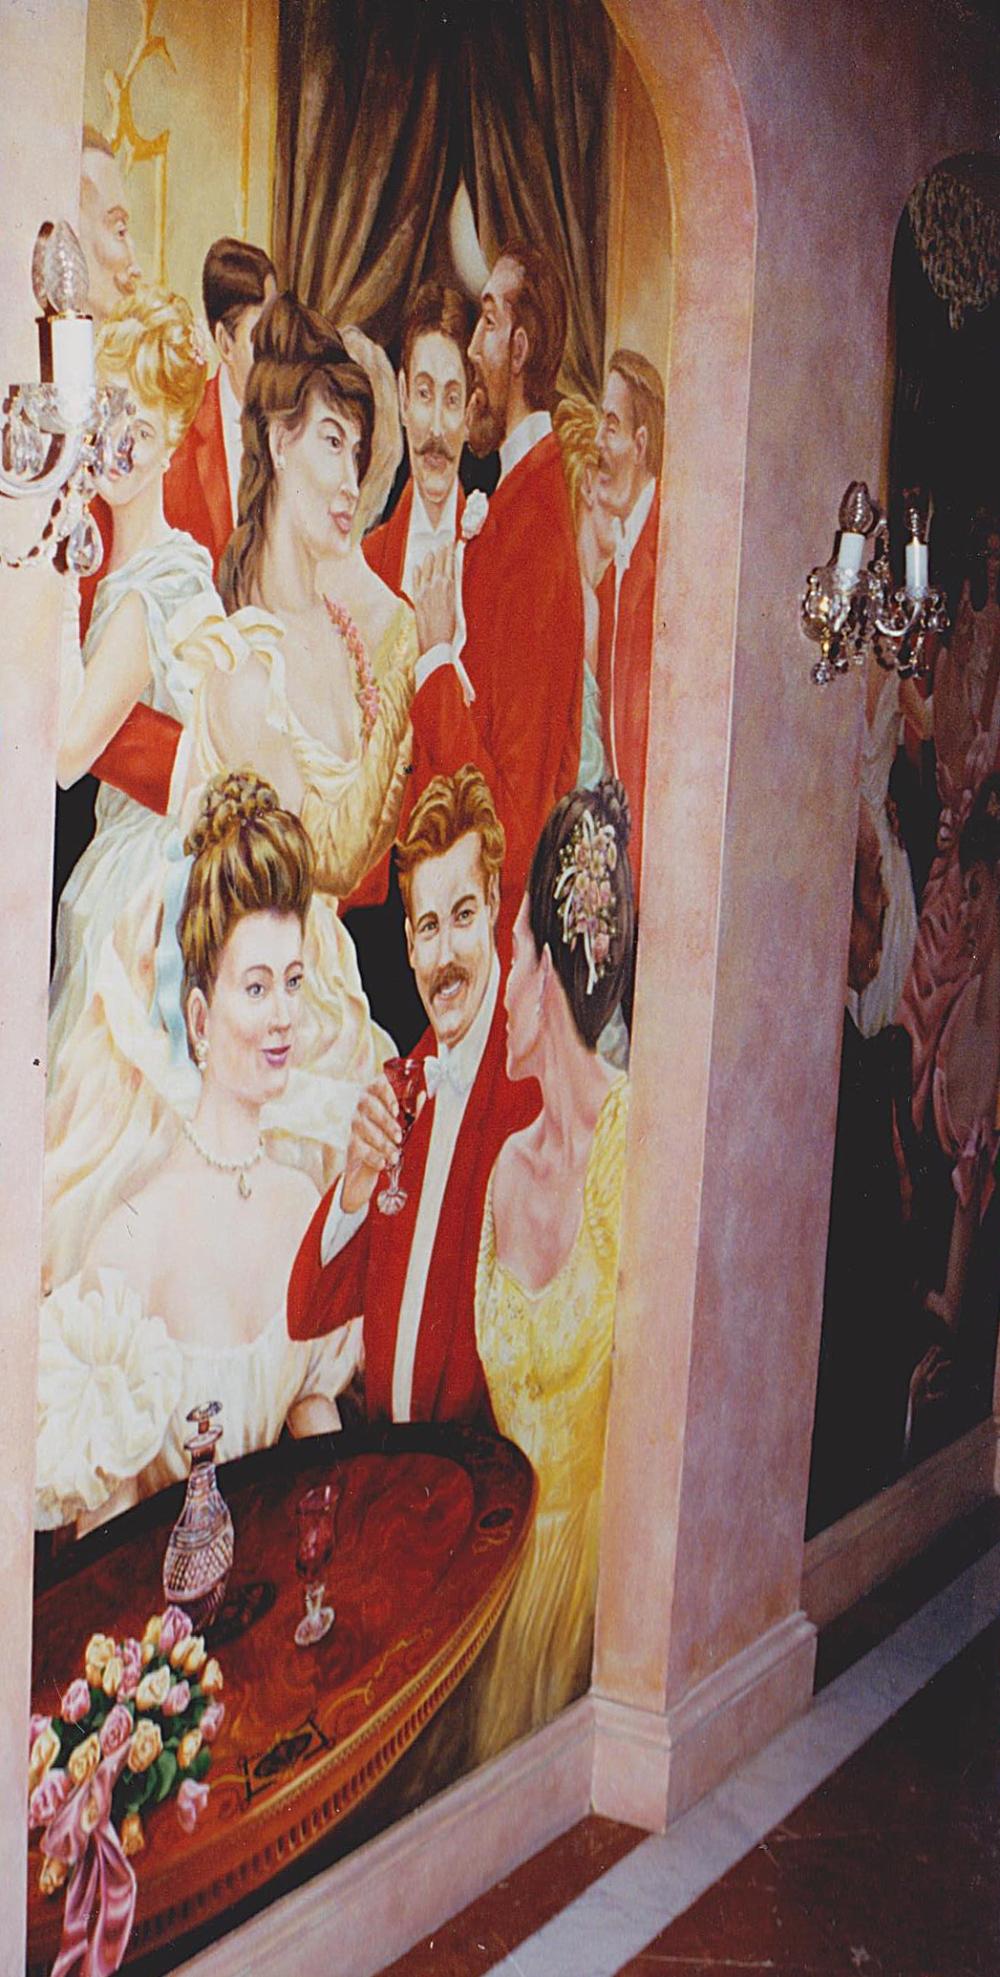 thornton_skase_house_mural4_1993